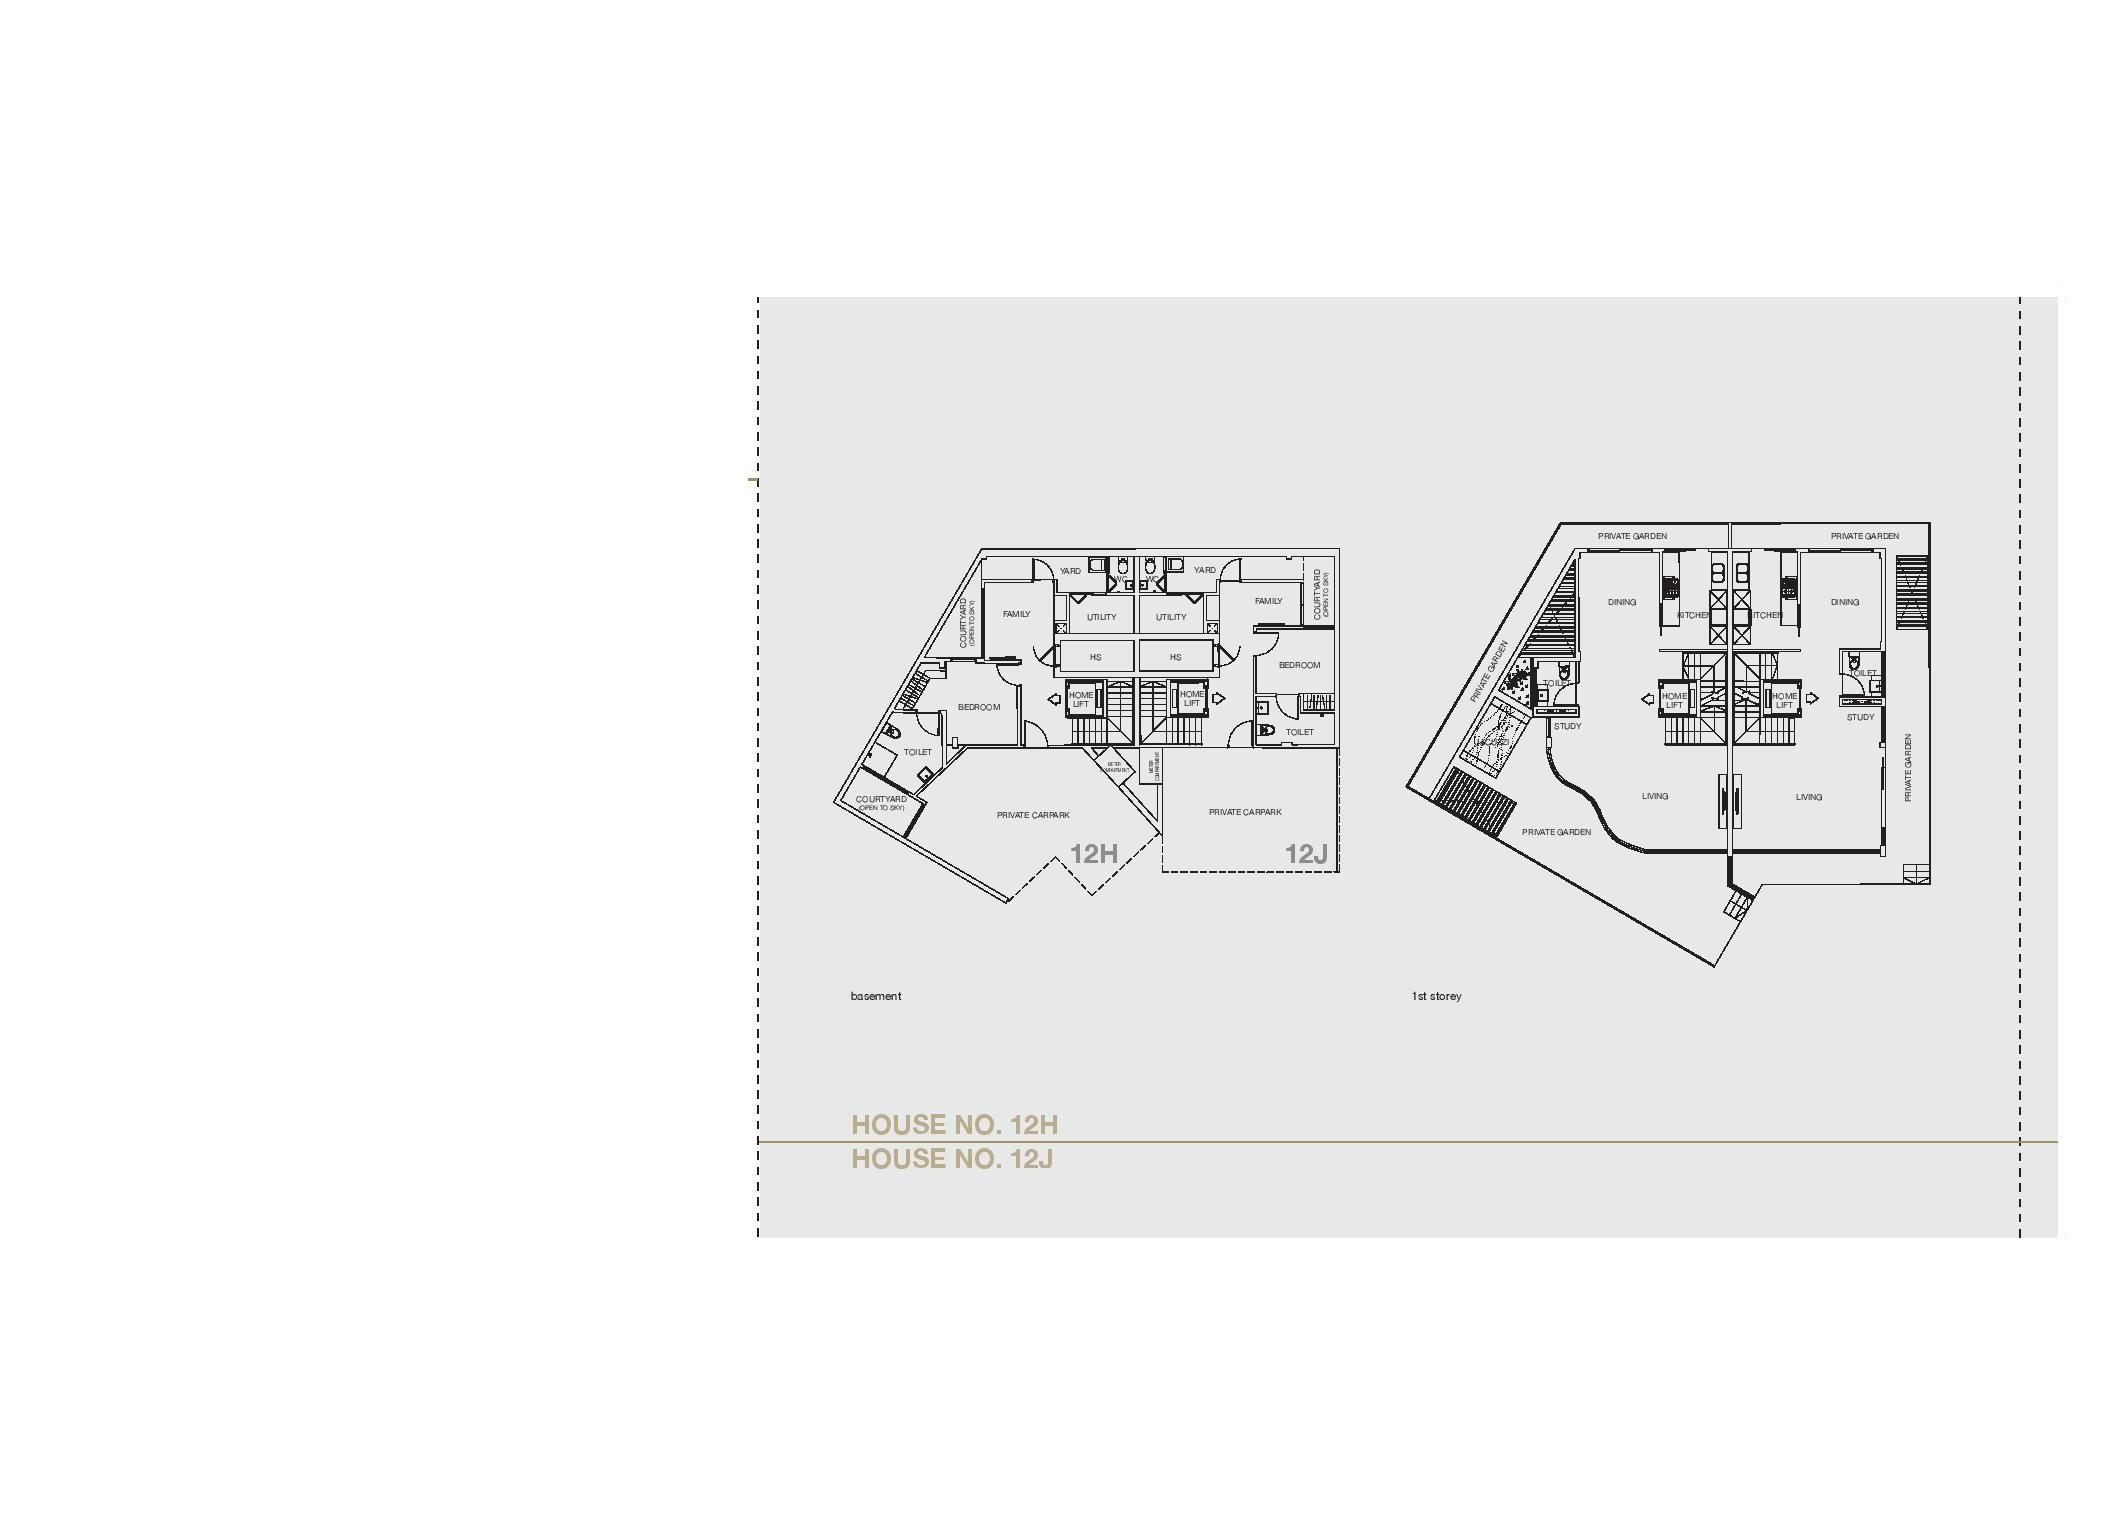 Chancery Hill Villas House 12H/12J Basement & 1st LevelFloor Plans